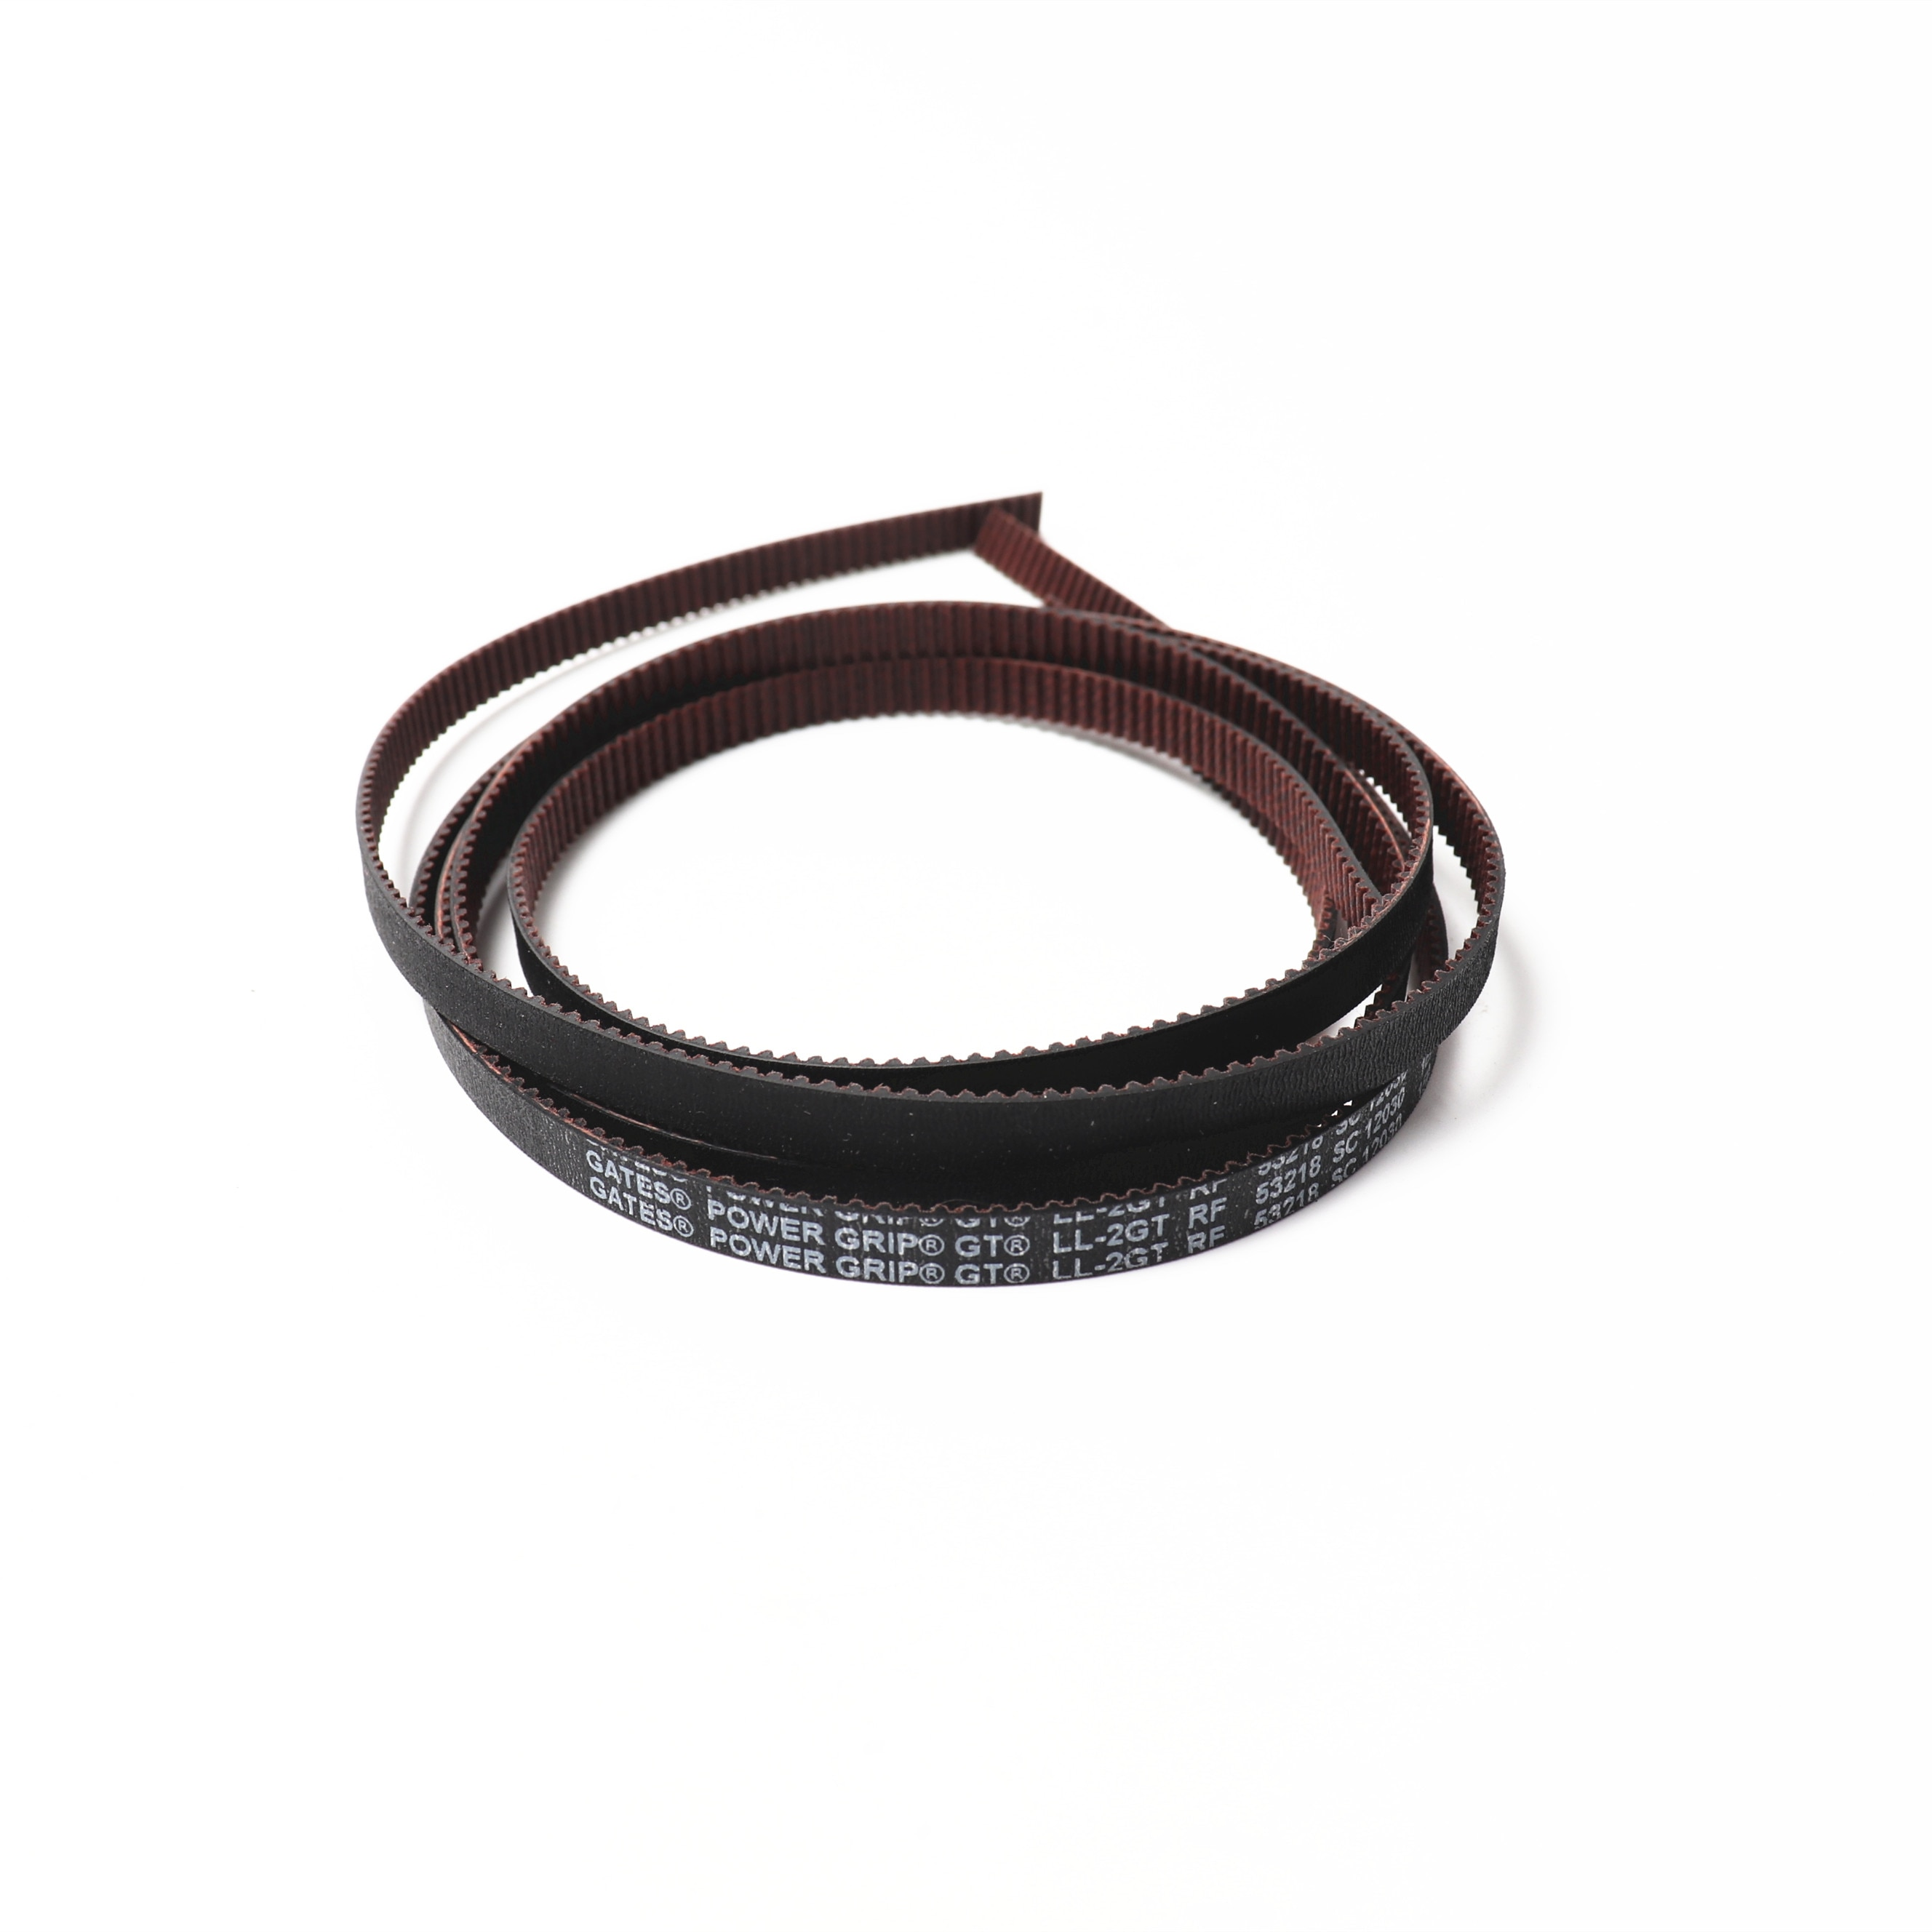 BLV 3d printer X/Y axis belt GATES-LL-2GT gear synchronous belt GT2 Width 6MM , 4 meters long